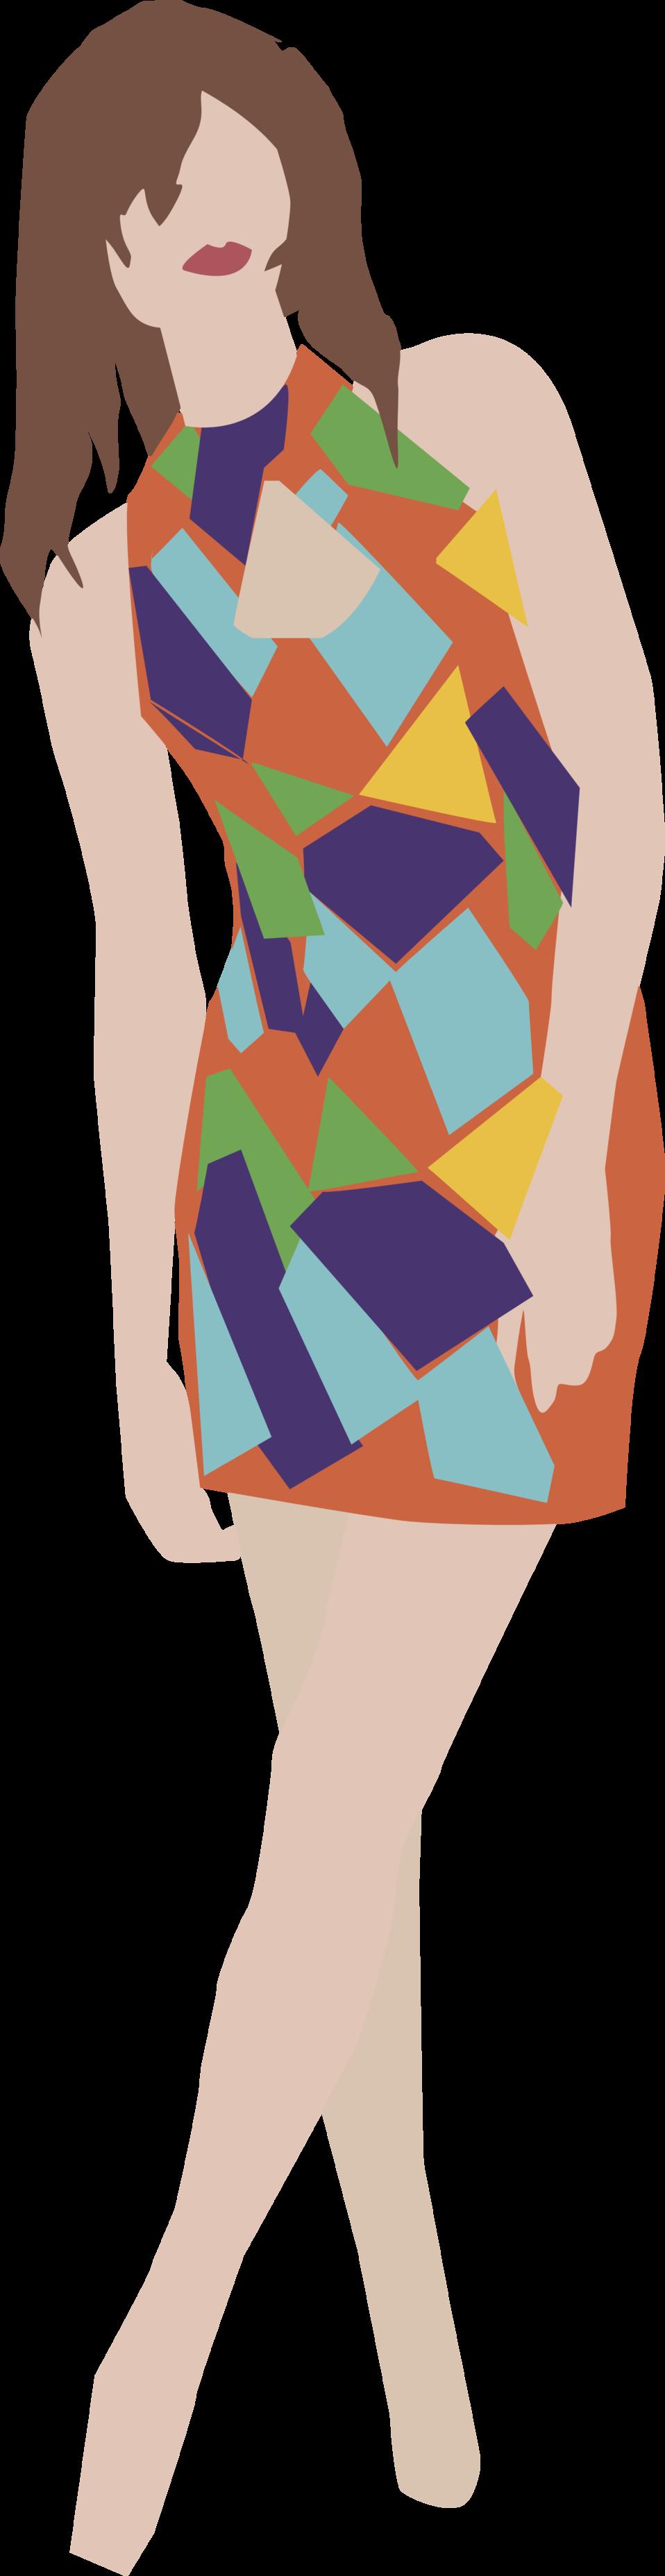 Girl in a dress.